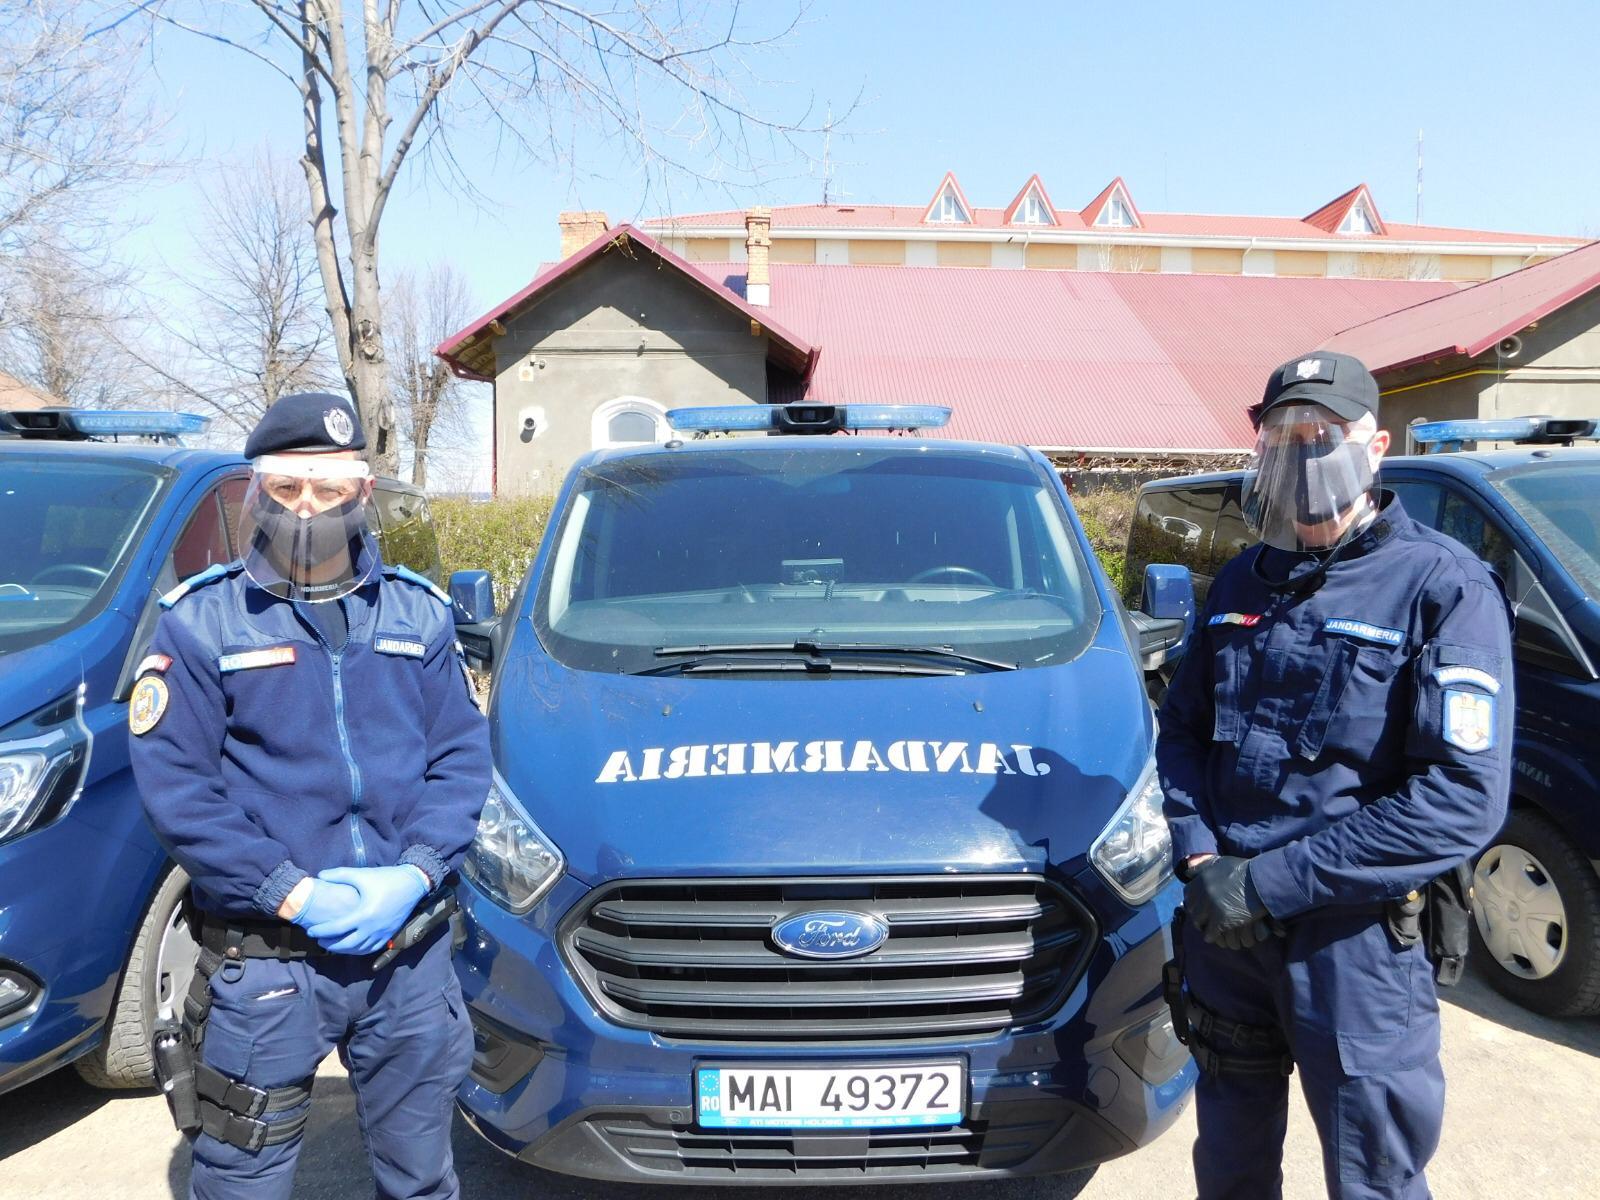 COVID-19: Echipament de protecție donat jandarmilor botoșăneni